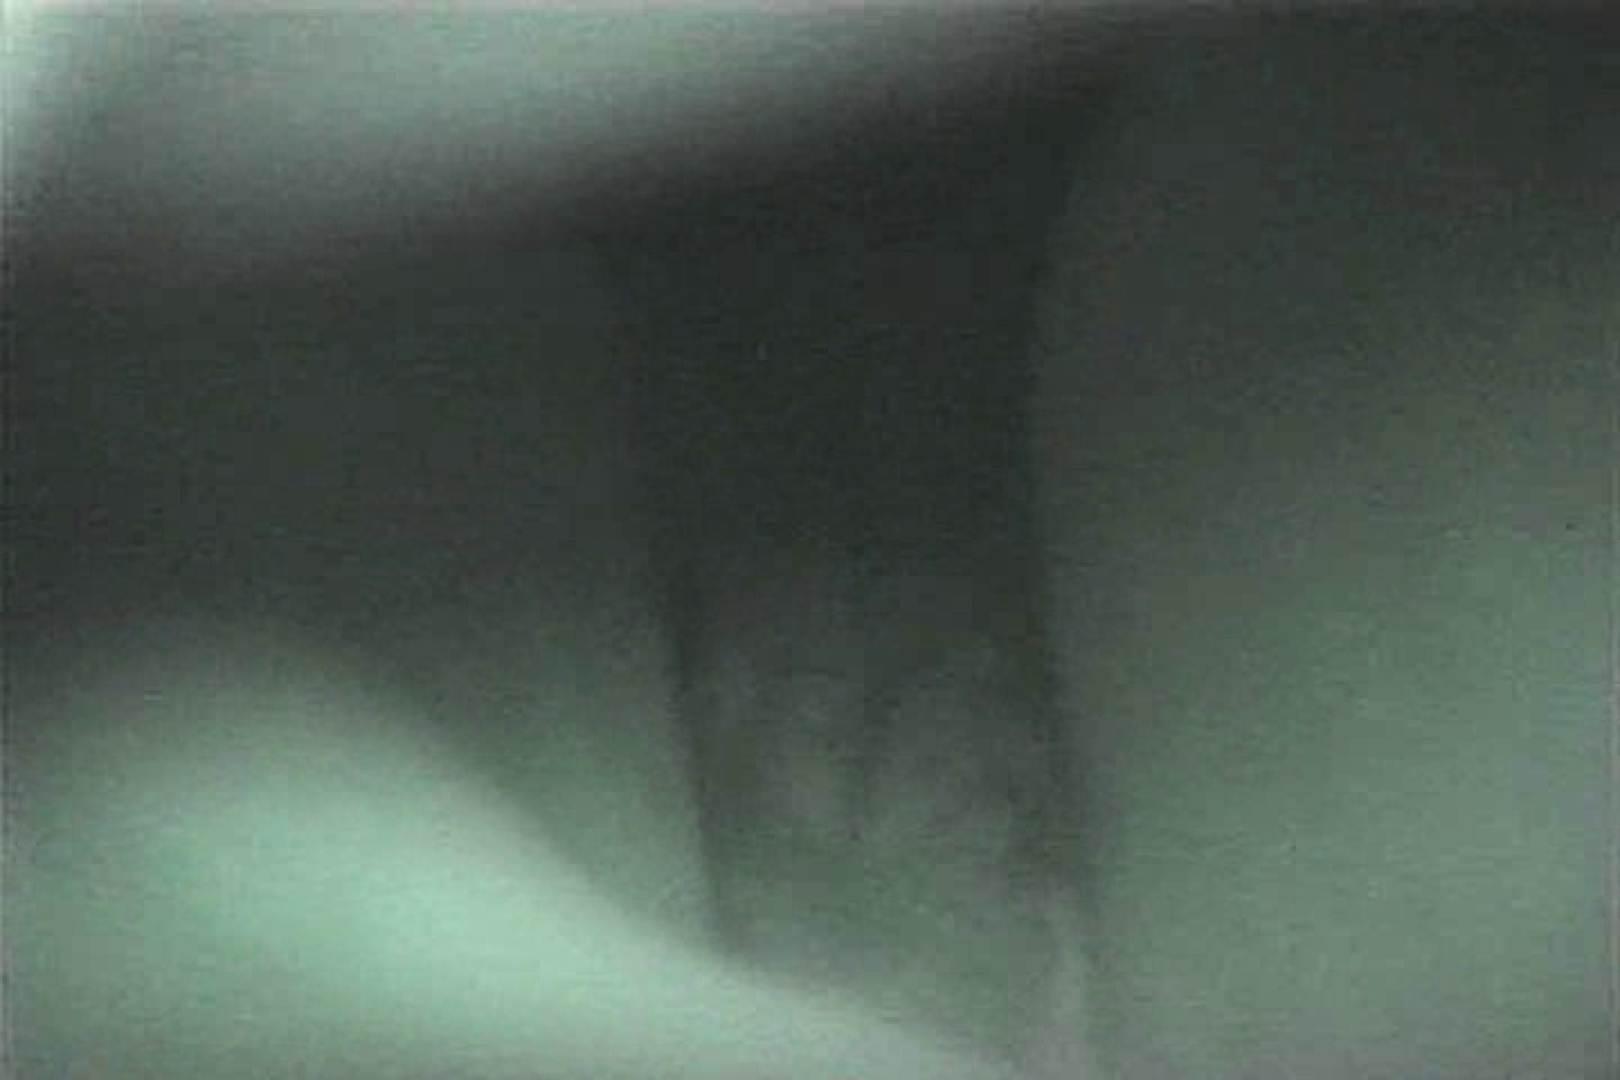 MASAさんの待ち伏せ撮り! 赤外線カーセックスVol.1 独身エッチOL   赤外線  79pic 71